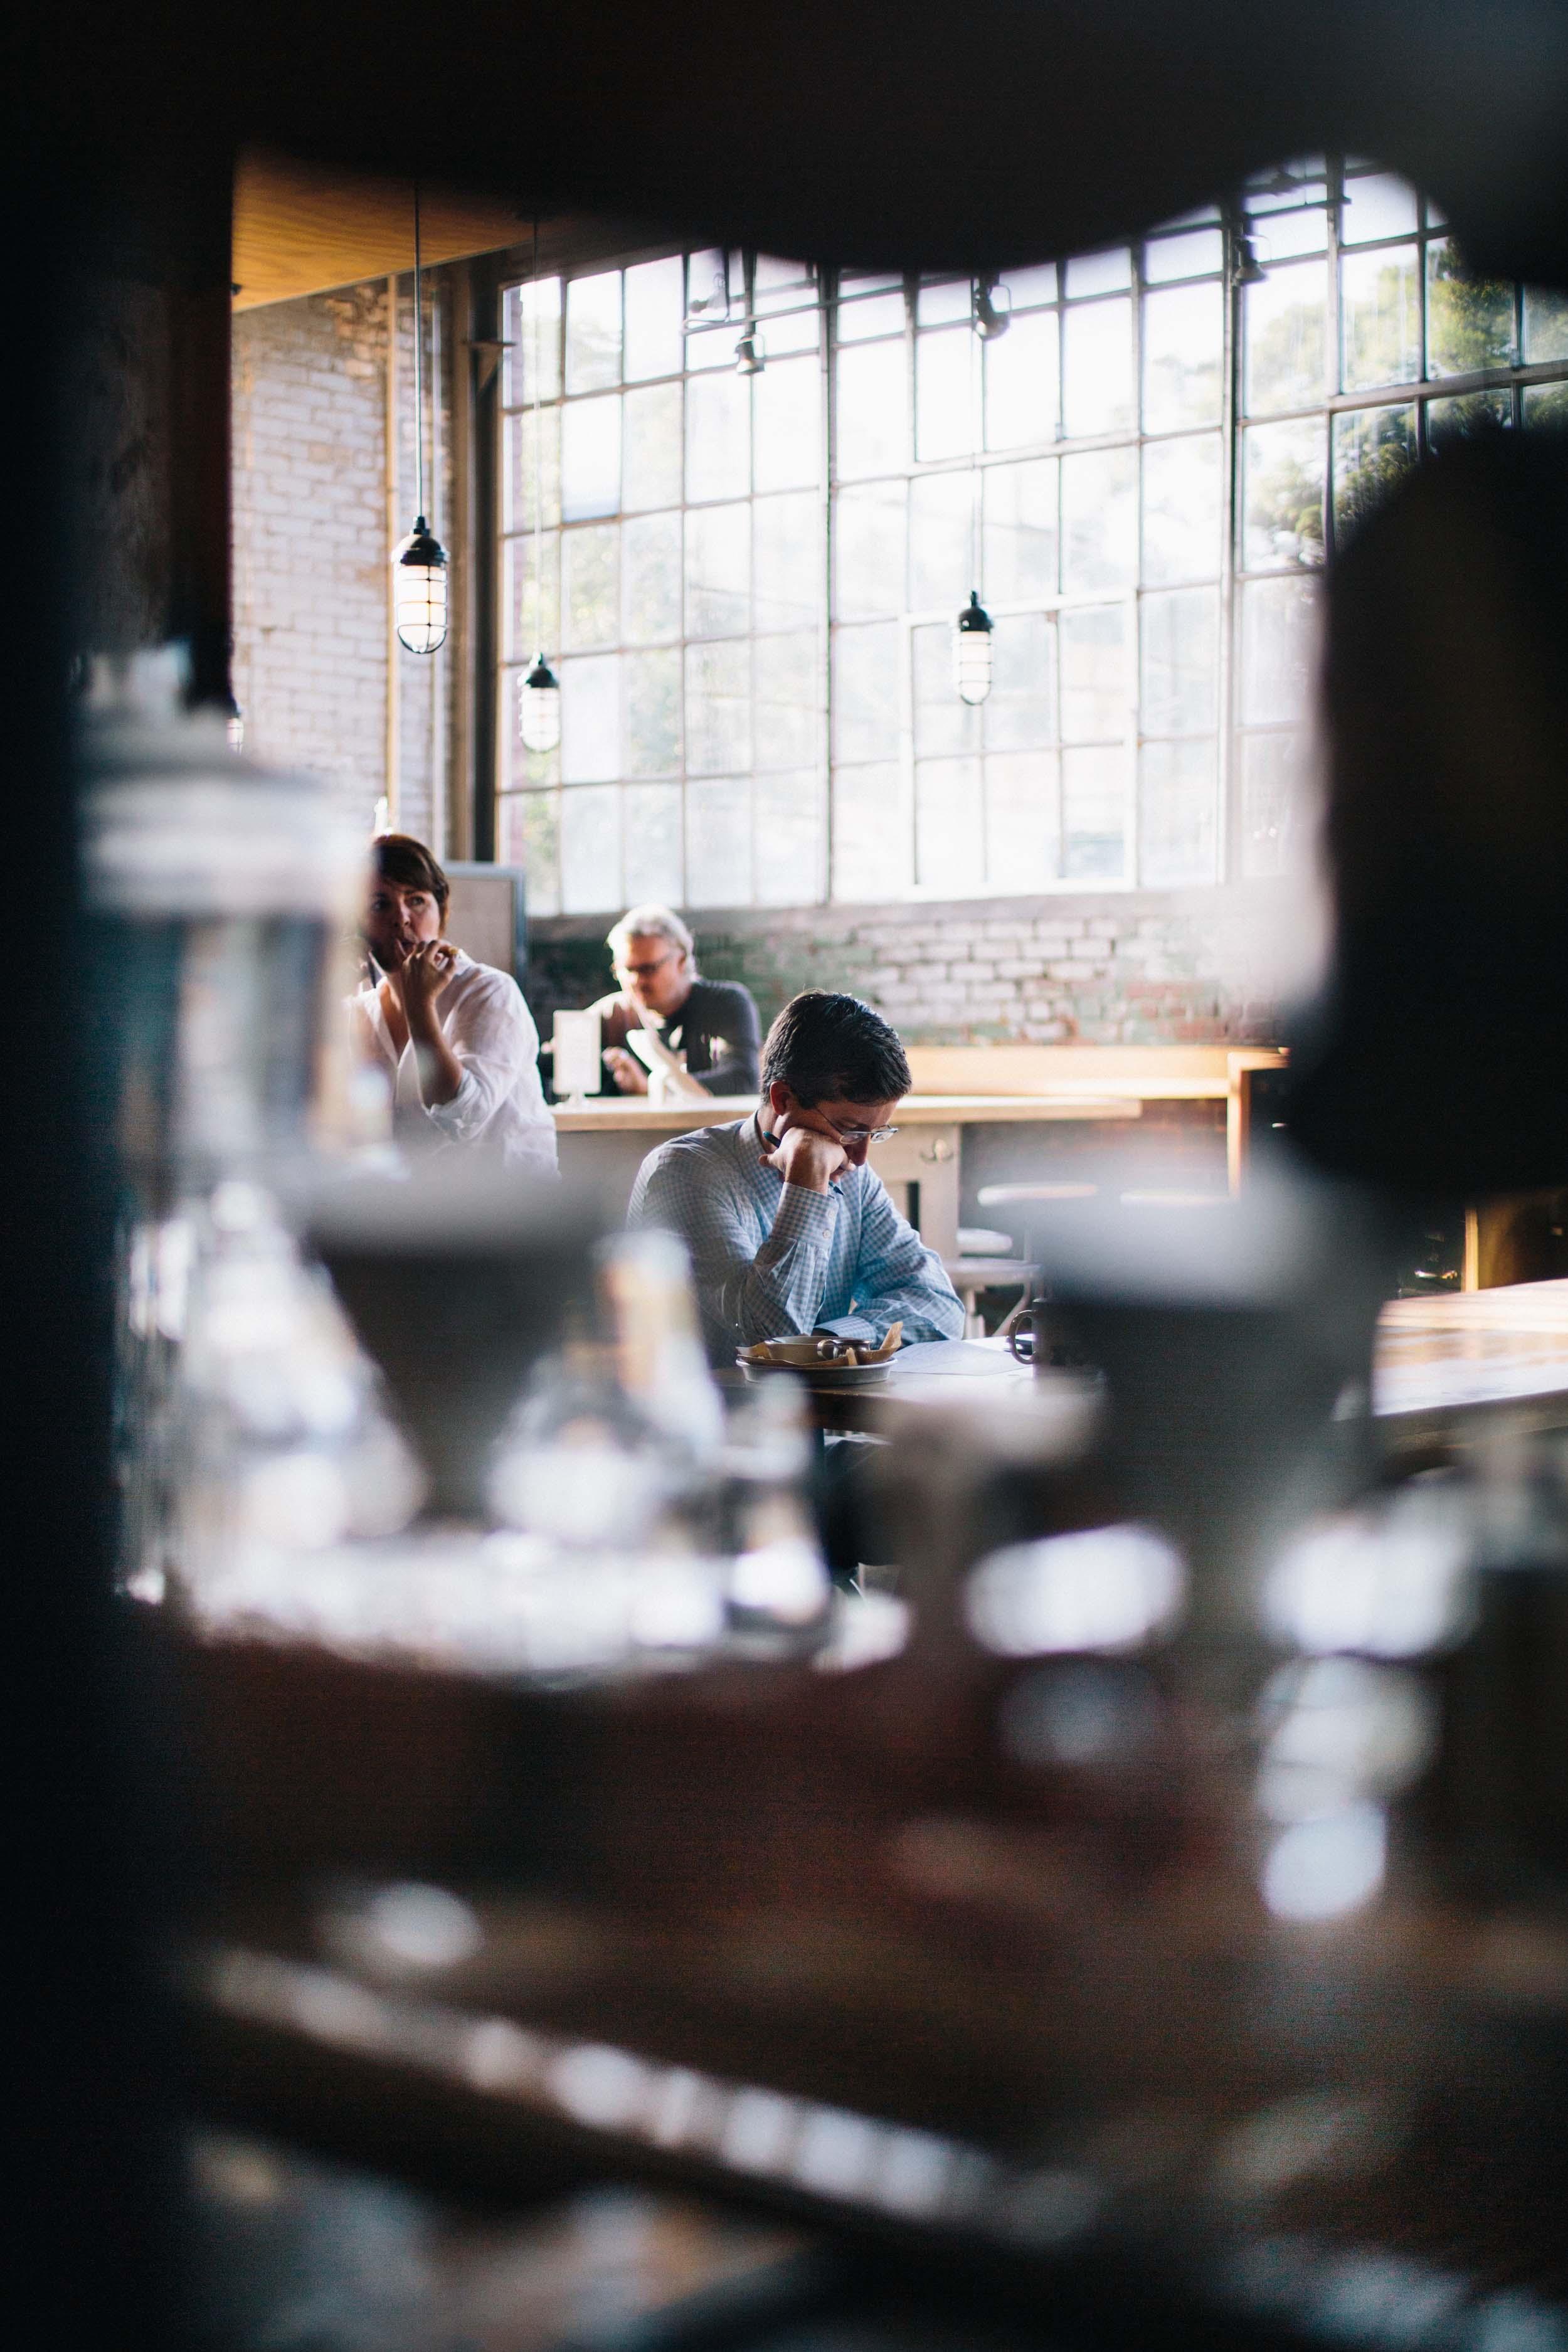 jimmy-rowalt-atlanta-coffee-food-drink-photography-072.jpg